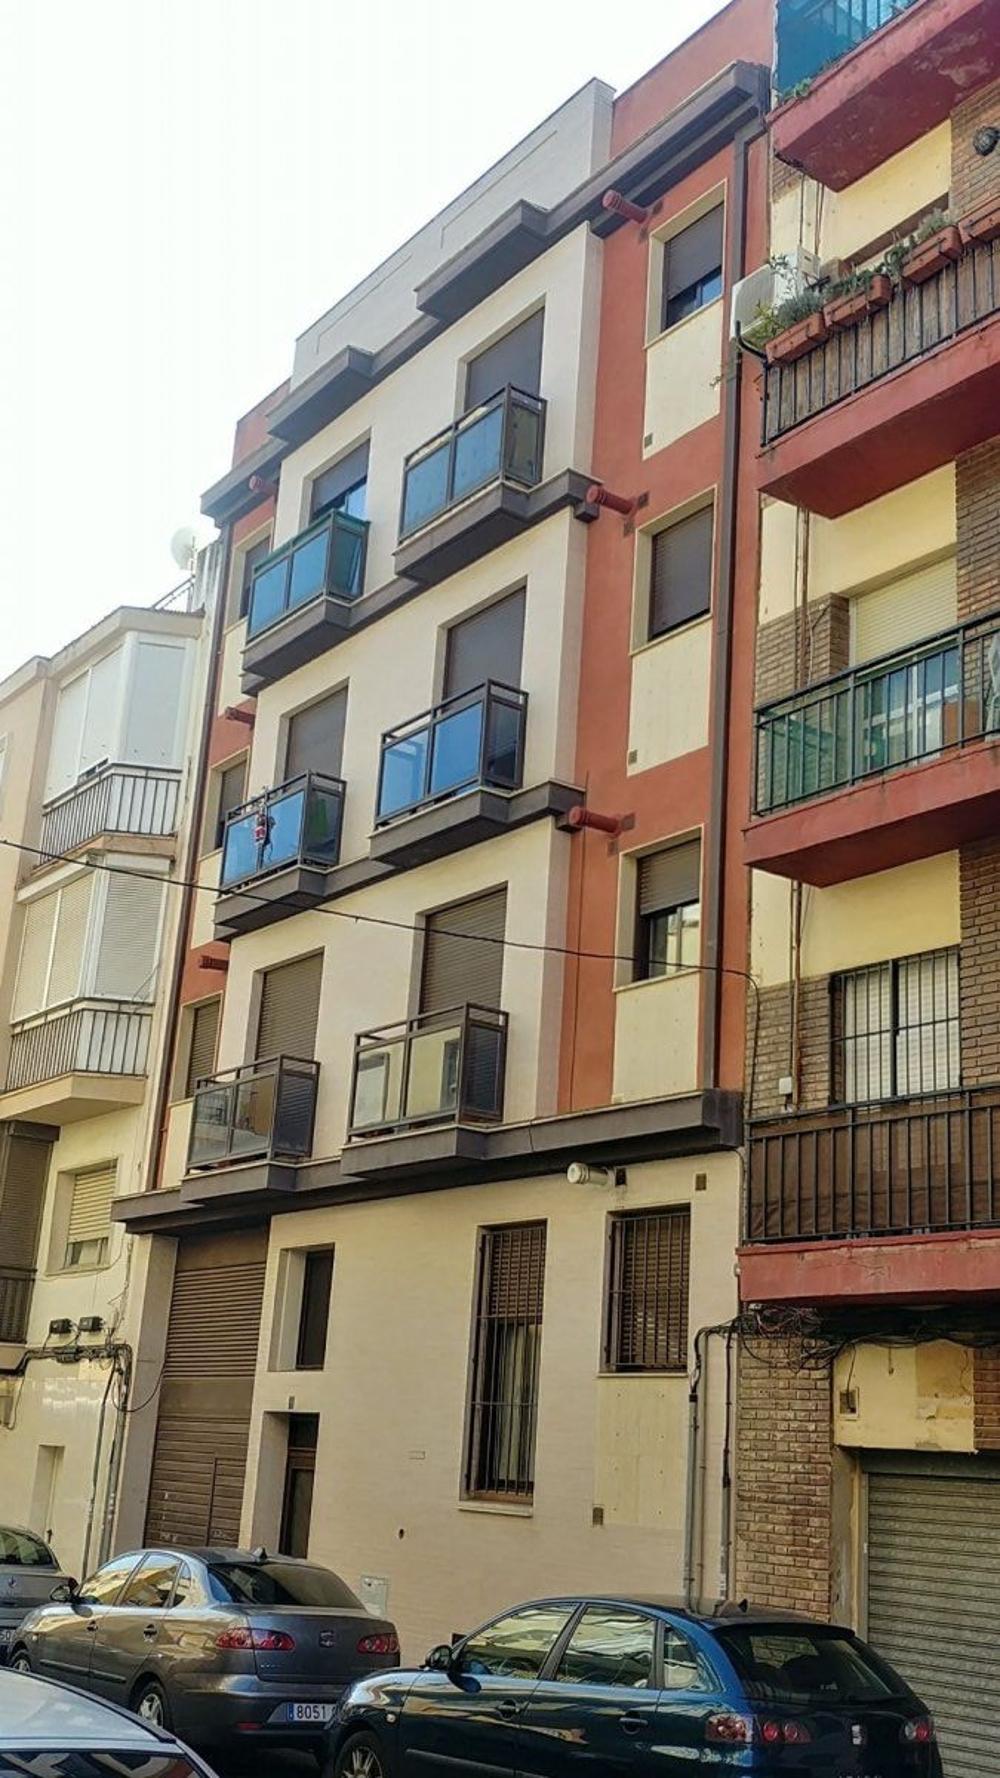 isla chica huelva apartment foto 3845025